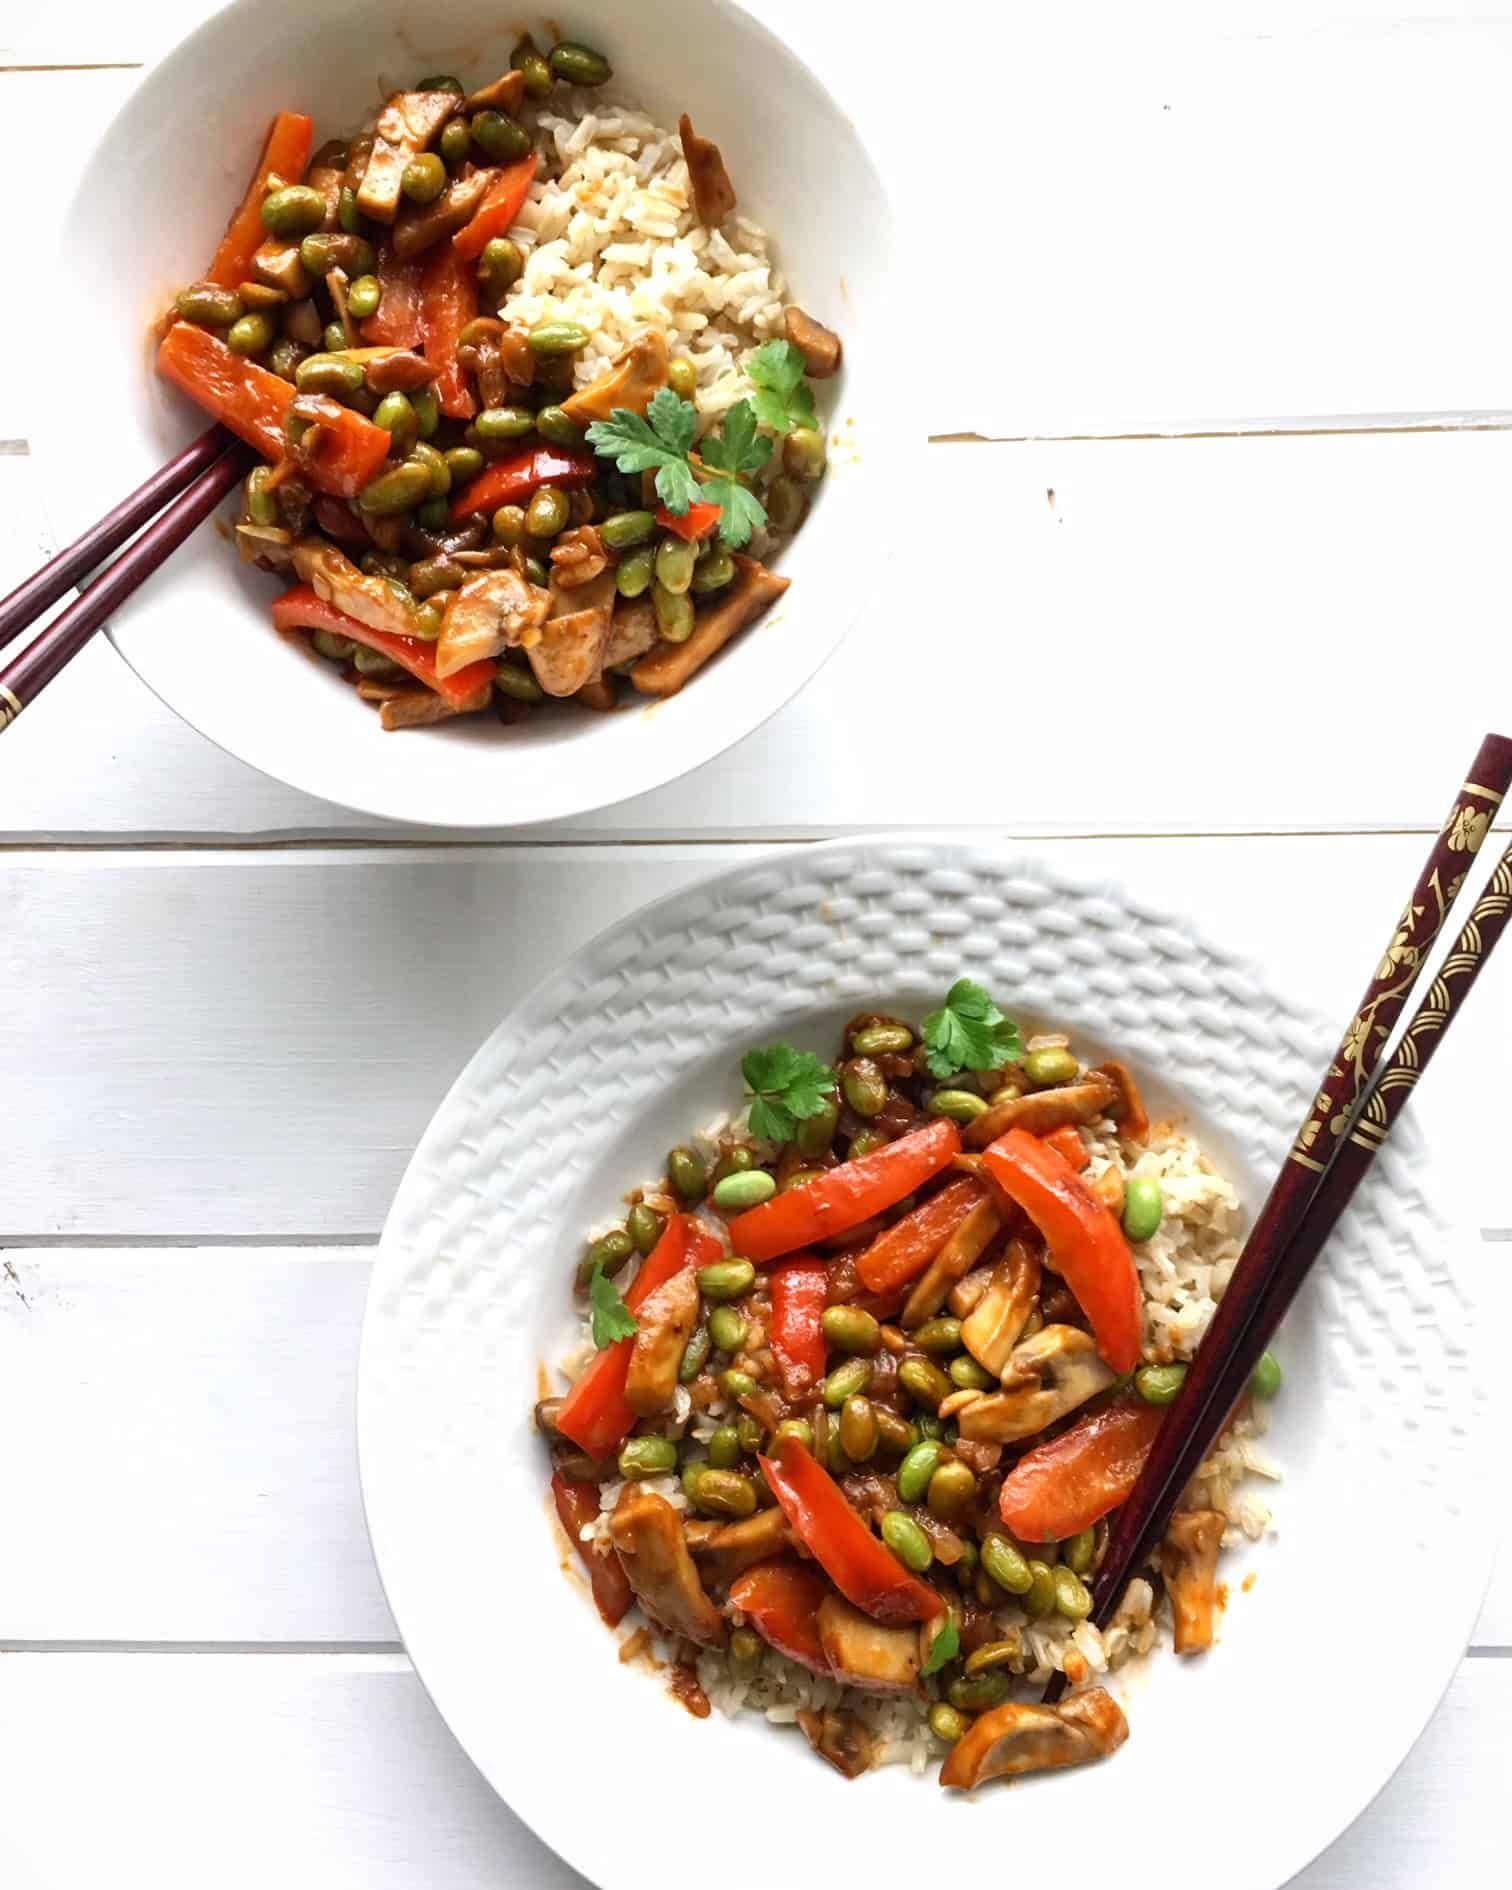 peanut & edamame vegan stir-fry